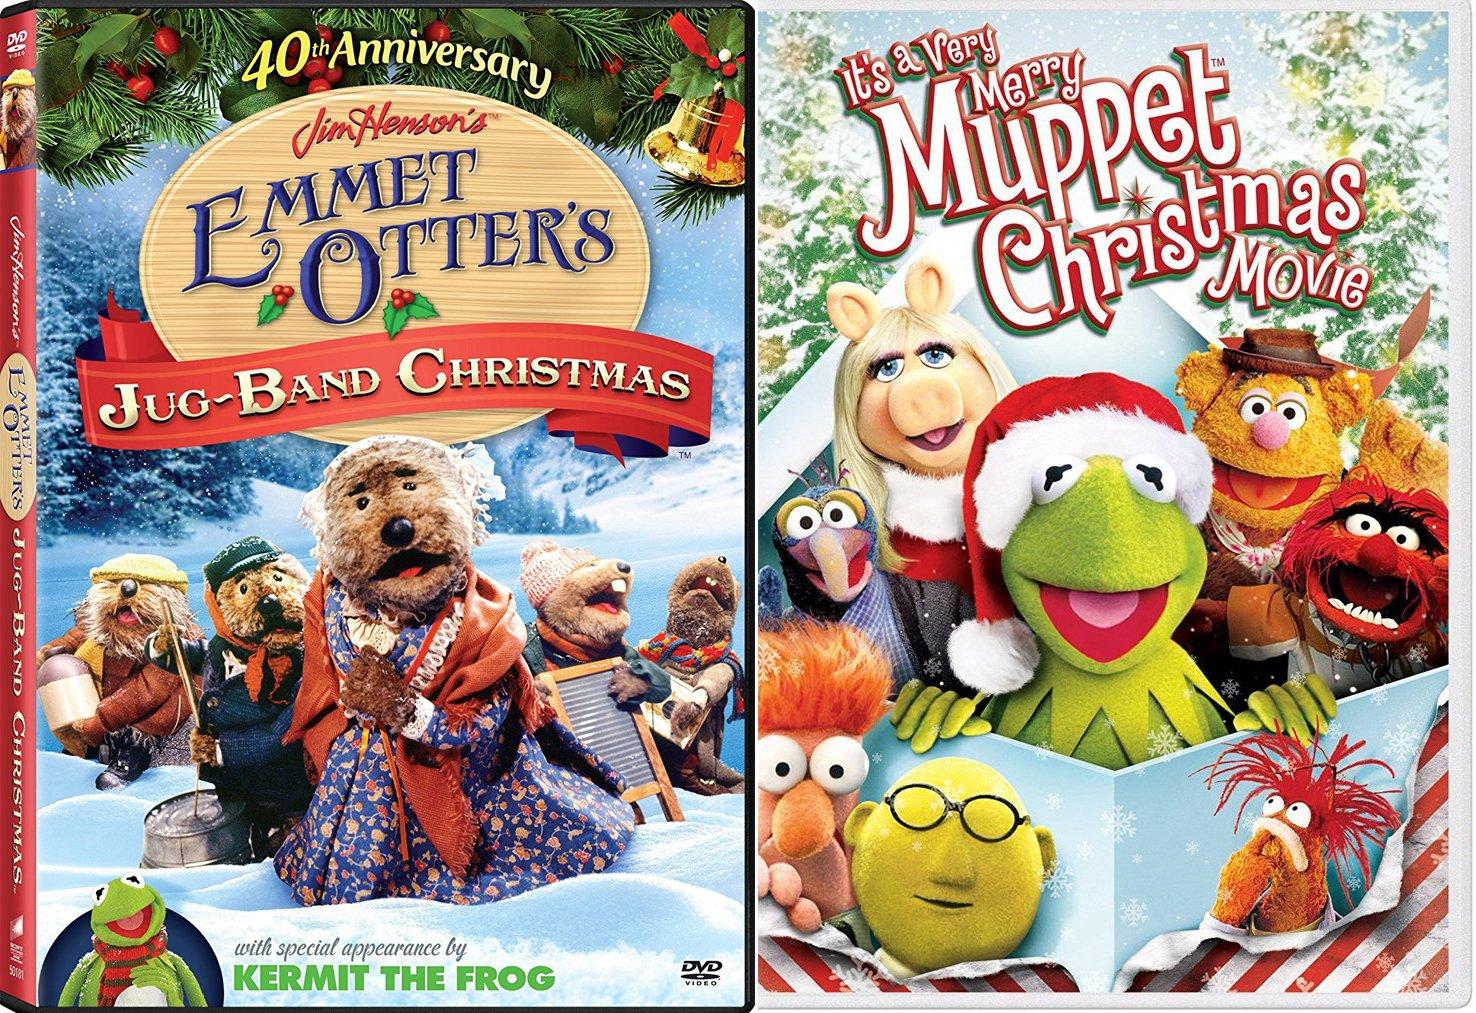 Amazon.com: Emmet Otter\'s Jug-Band Christmas Kermit the Frog DVD + ...